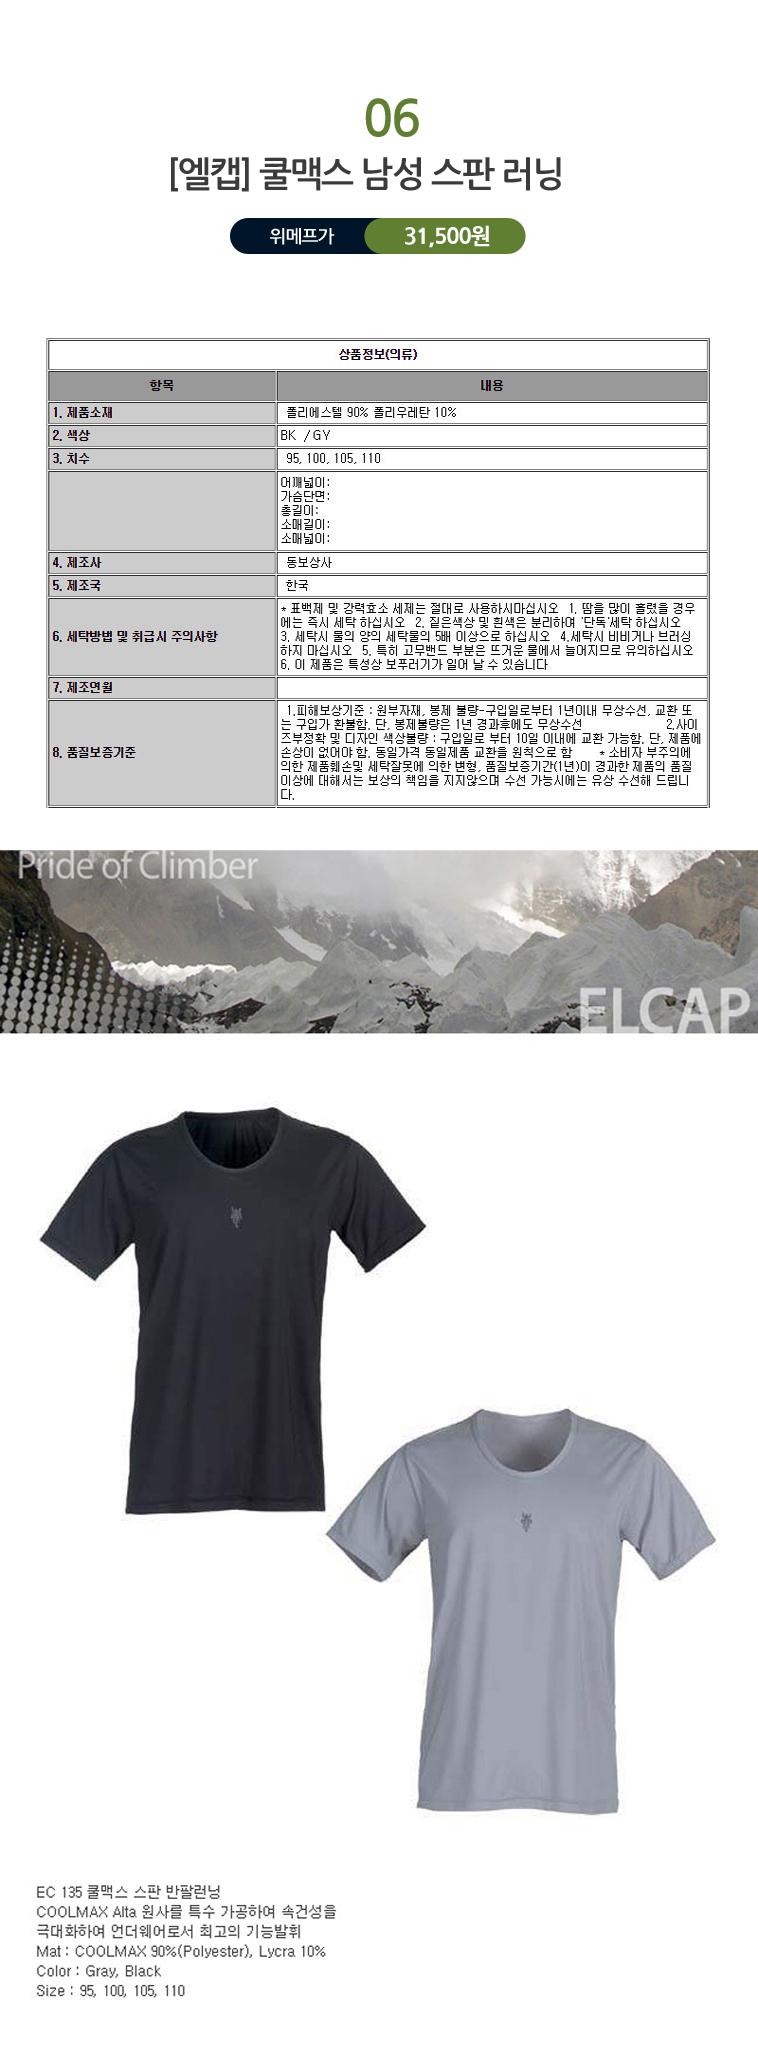 113bc478070 ... 무료배송] 스포츠 쿨맥스 속옷 모음 - 상세정보 ...